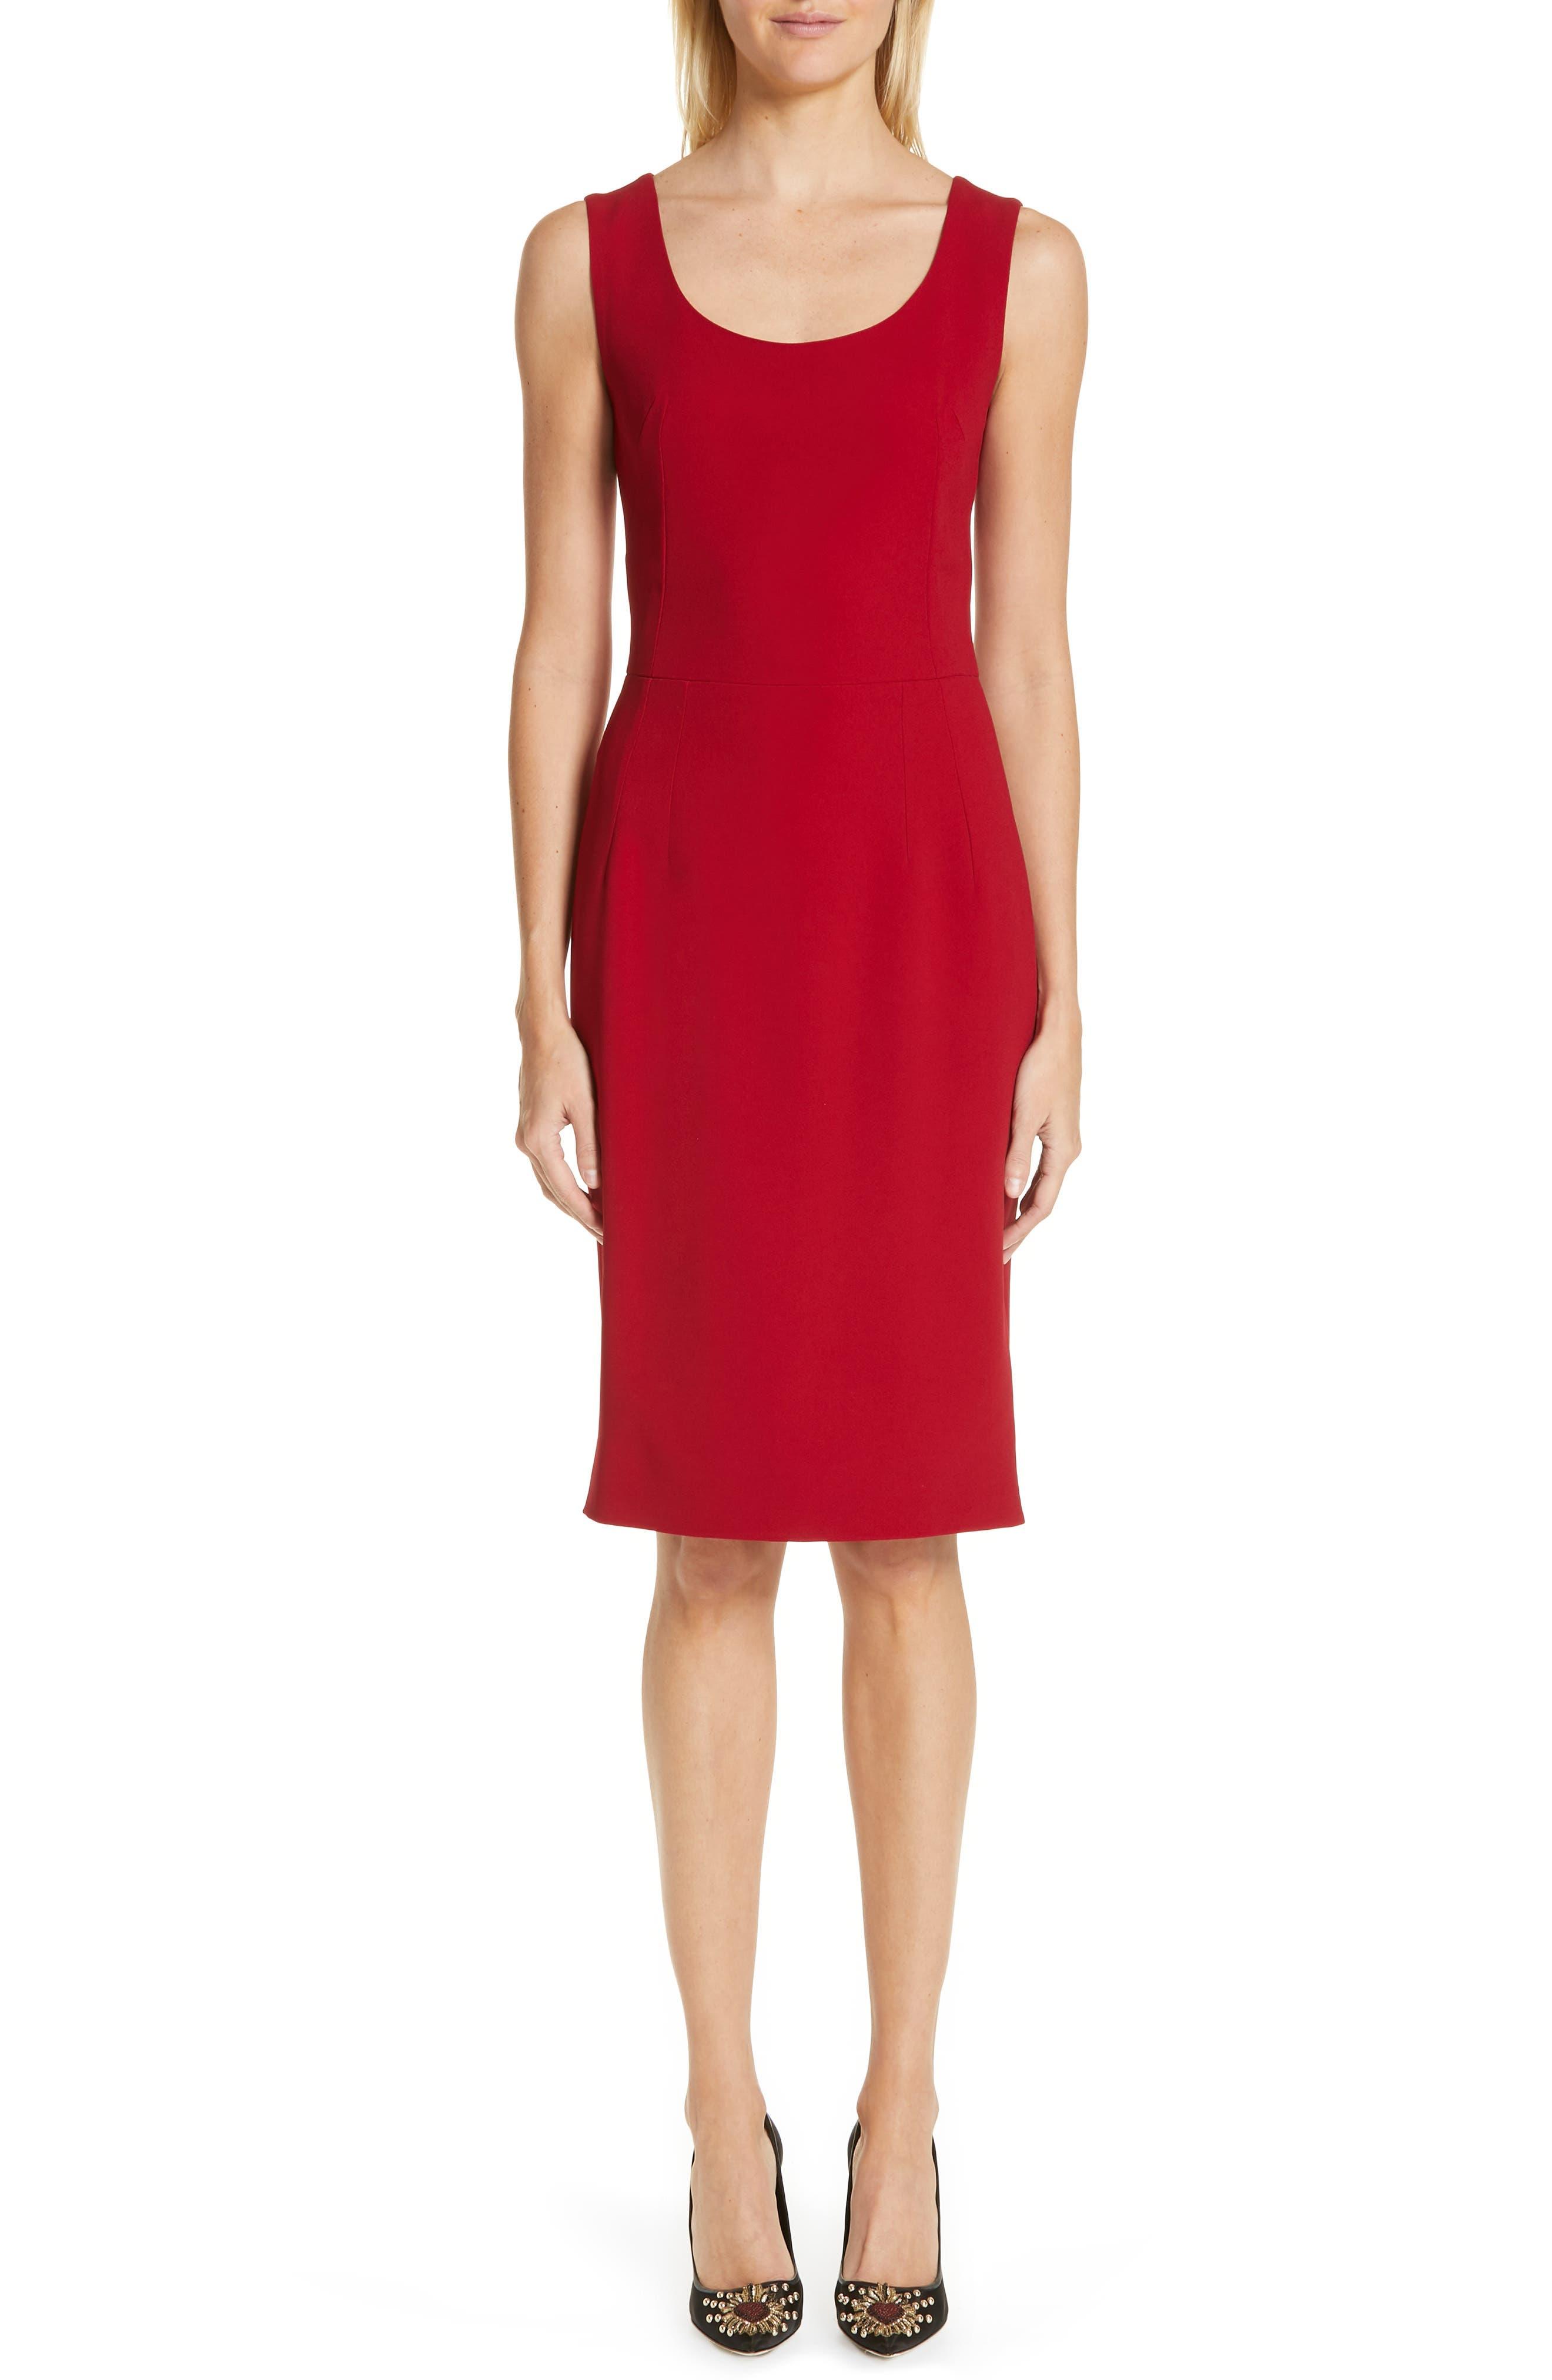 Dolce & gabbana Cady Pencil Dress, US / 48 IT - Burgundy